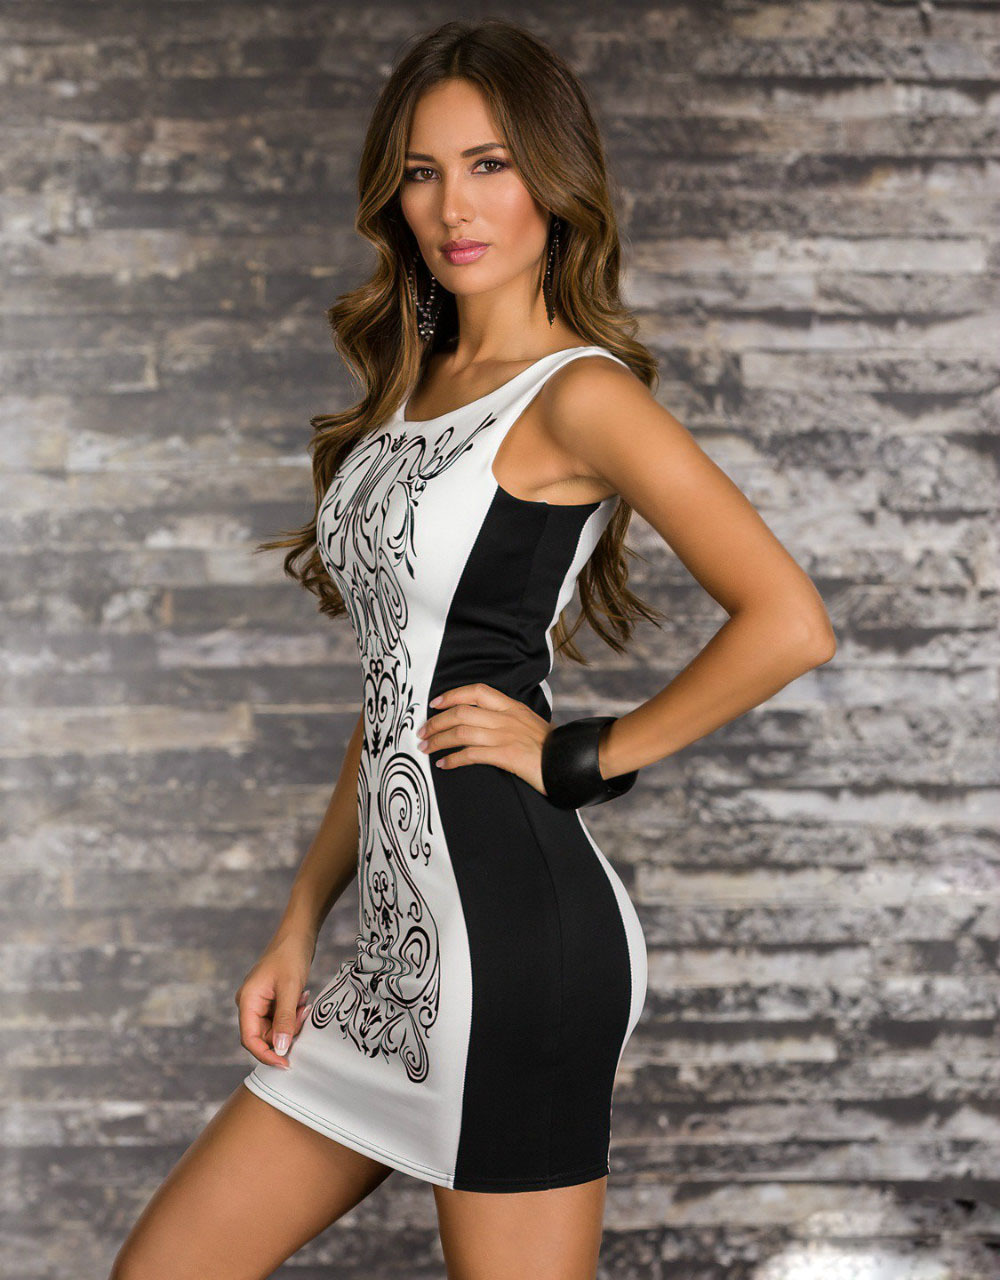 Black Tank Dress Plus Size Casual Dress Images